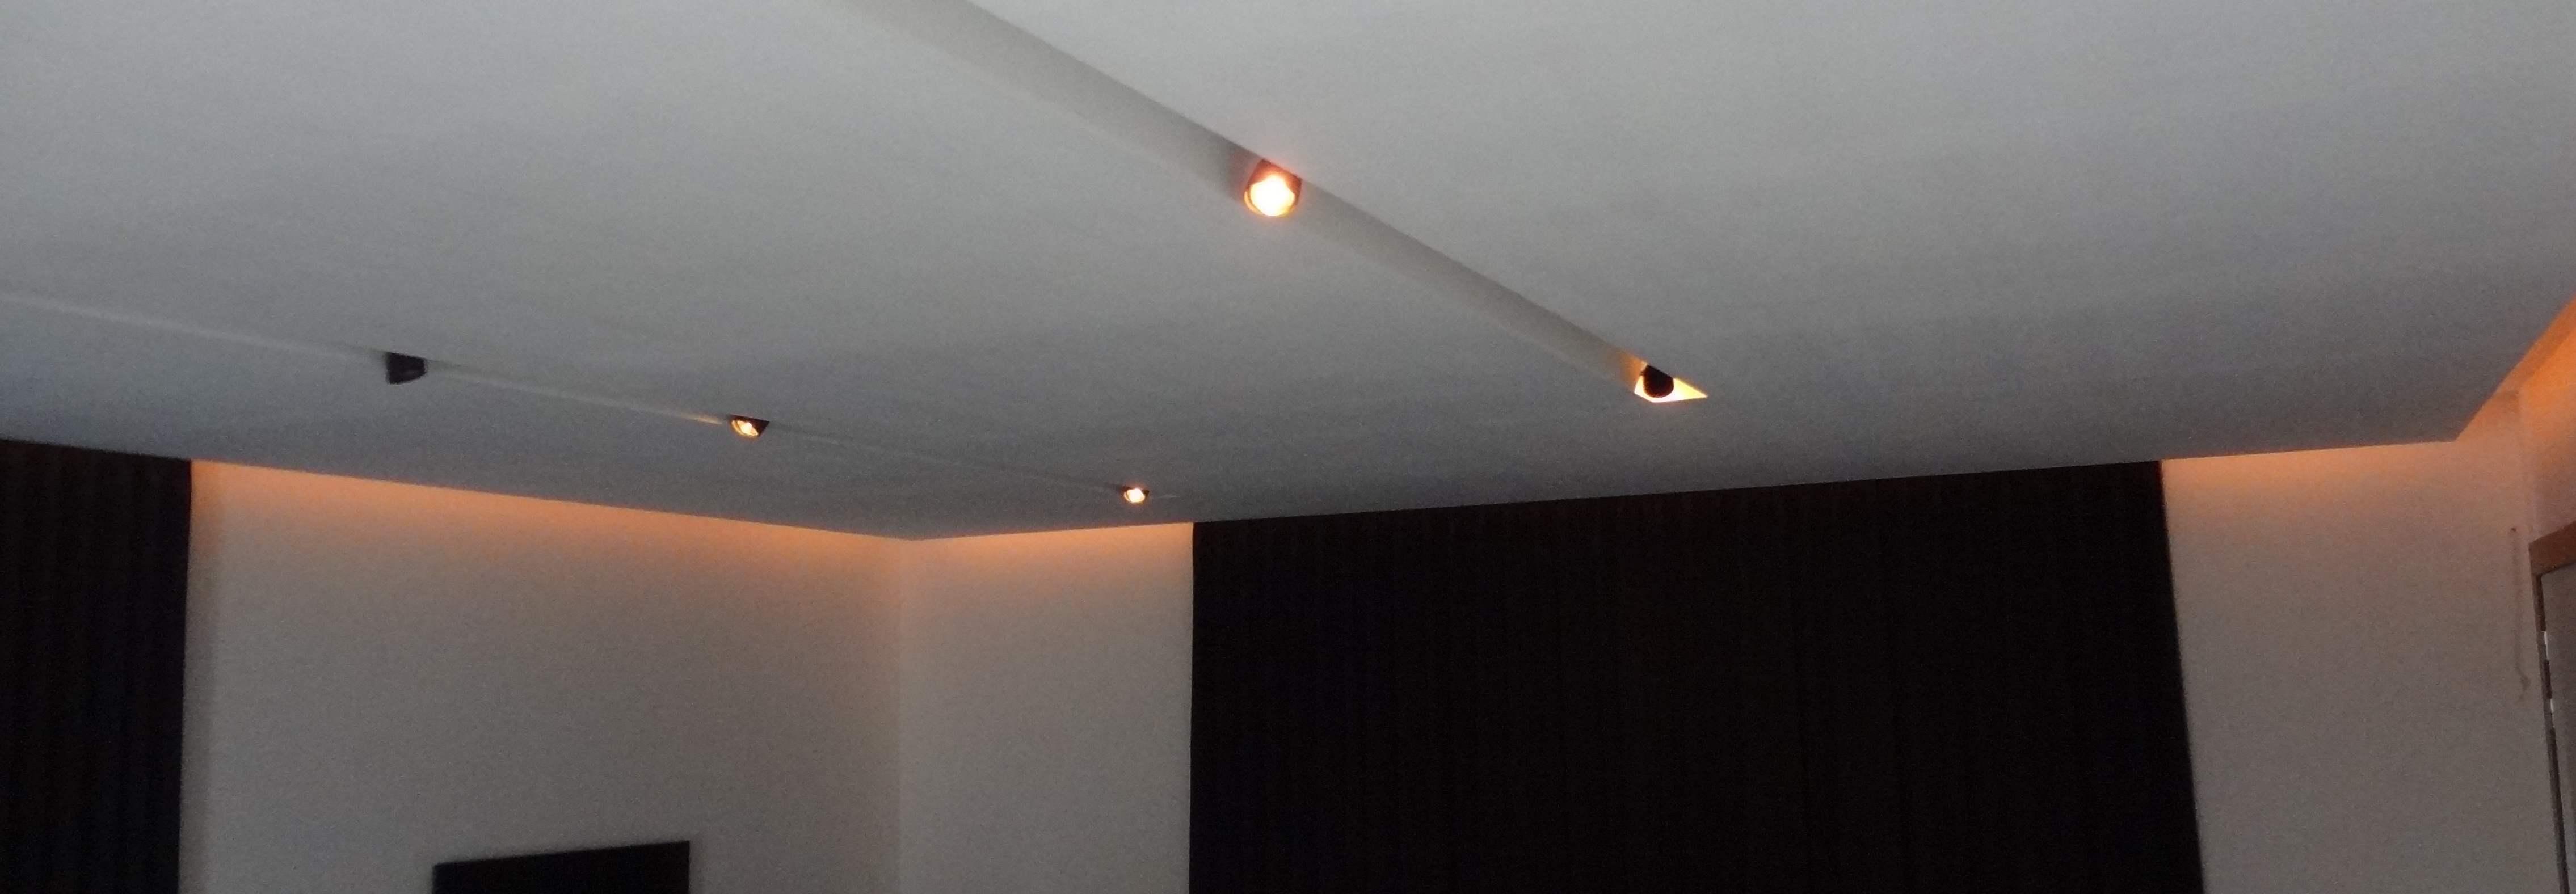 Verlaagd plafond afwerking fase 2 (interieur en decoratie)